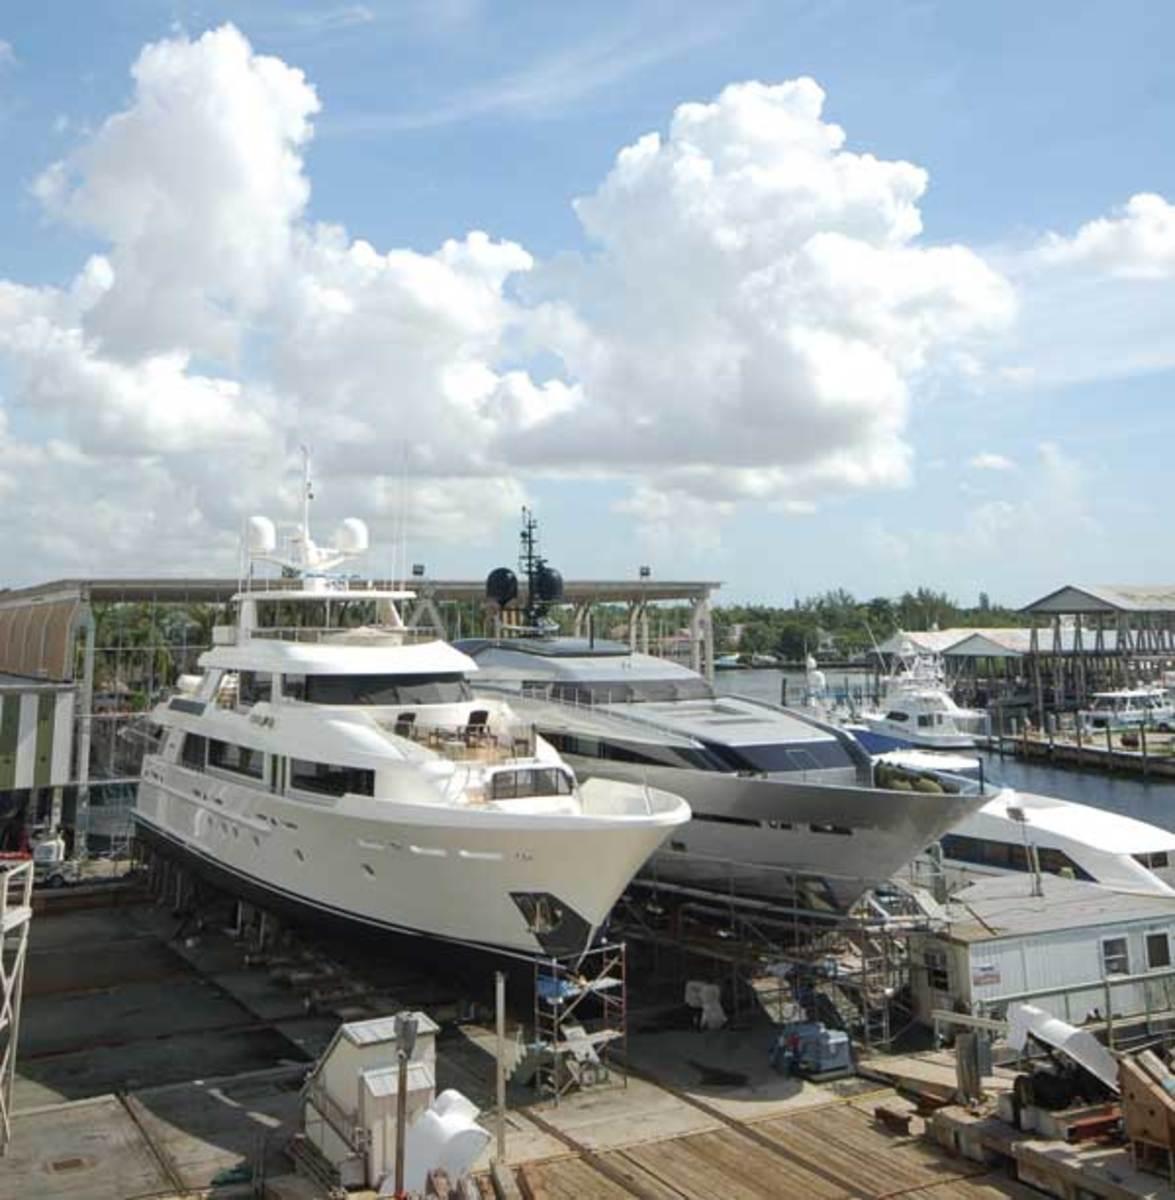 Bradford Marine in Ft. Lauderdale, Florida